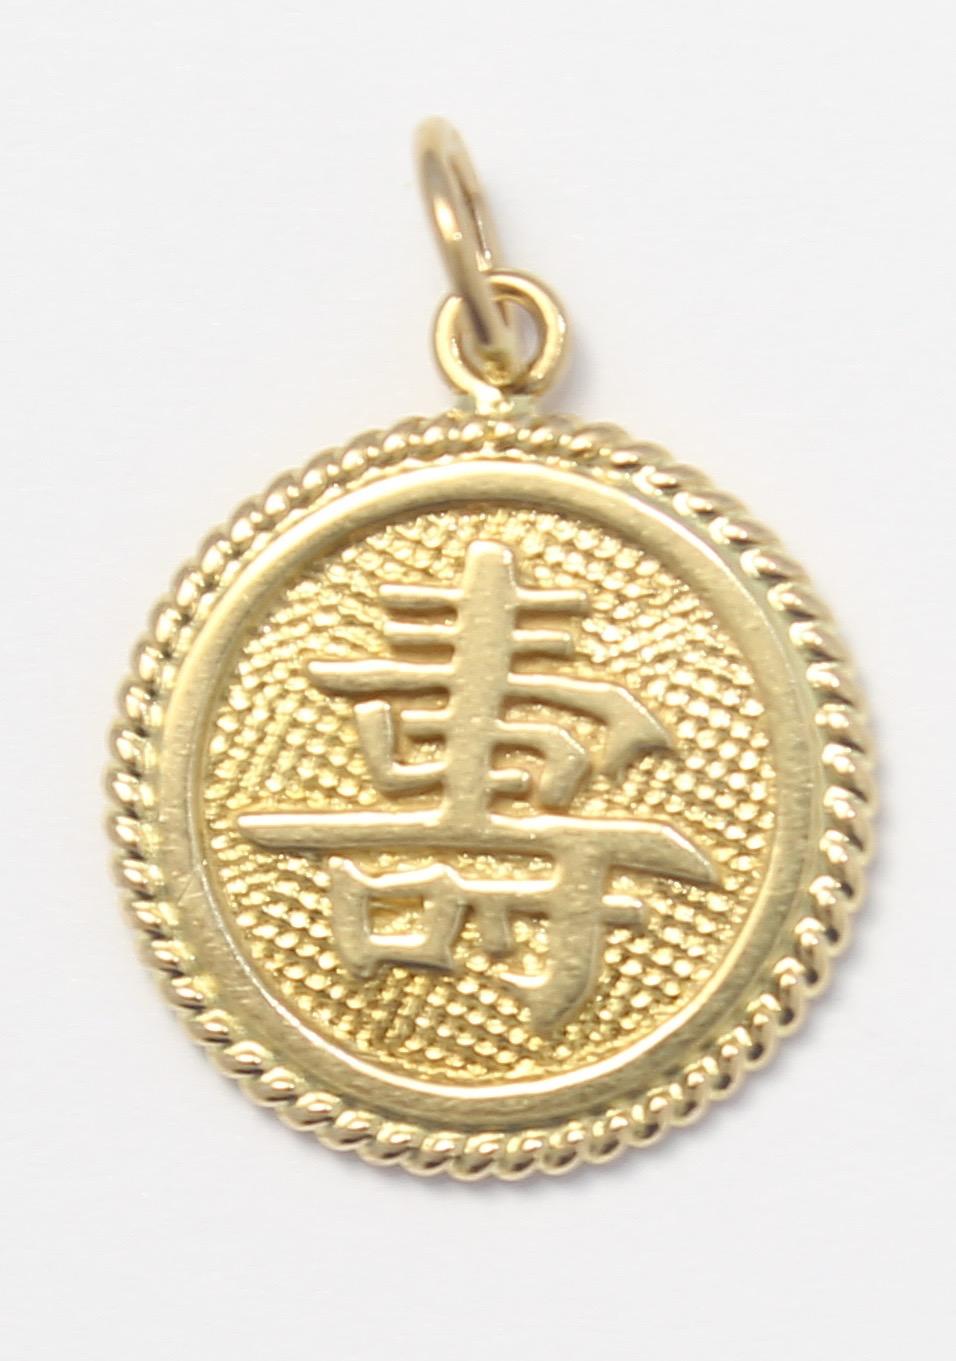 18k Yellow Gold Chinese Symbol Words Charm Necklace Pendant Ebay